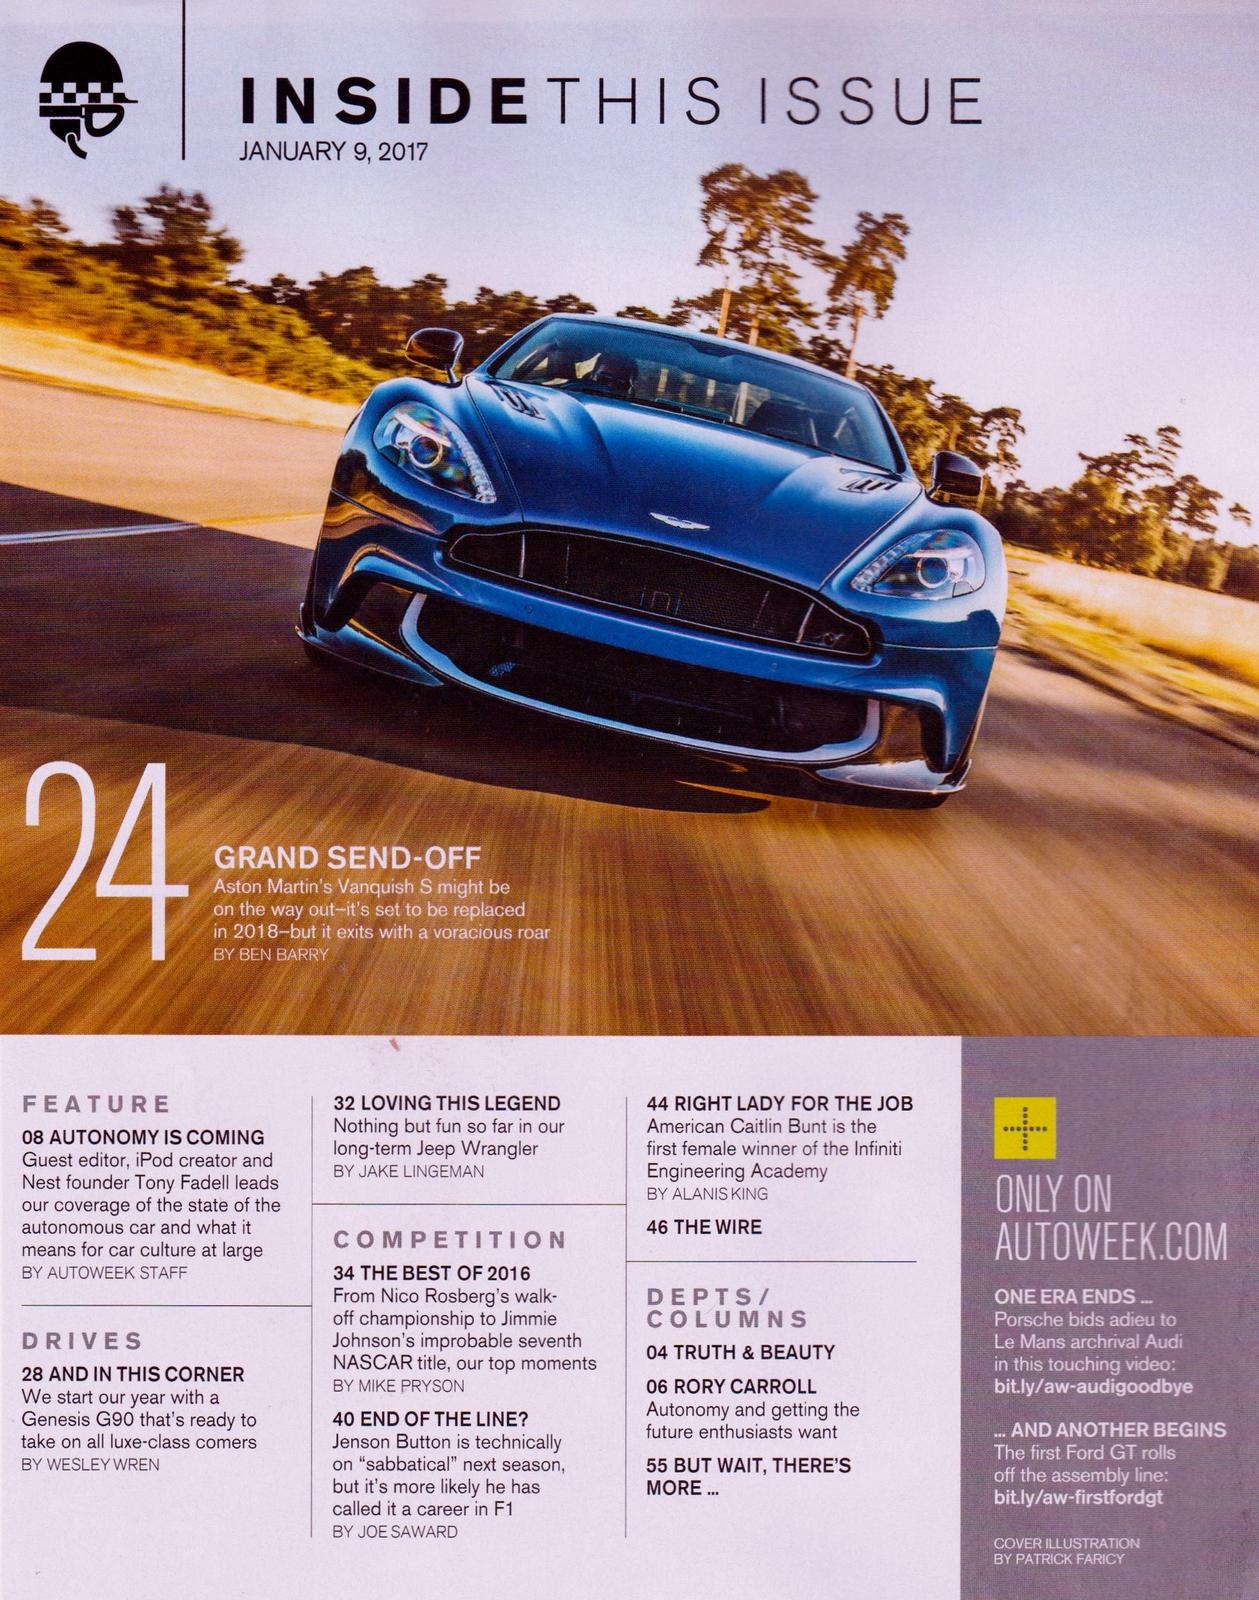 Autoweek January 9 2017 NEW, no label. Aston Martin's Vanquish S, Genesis G90